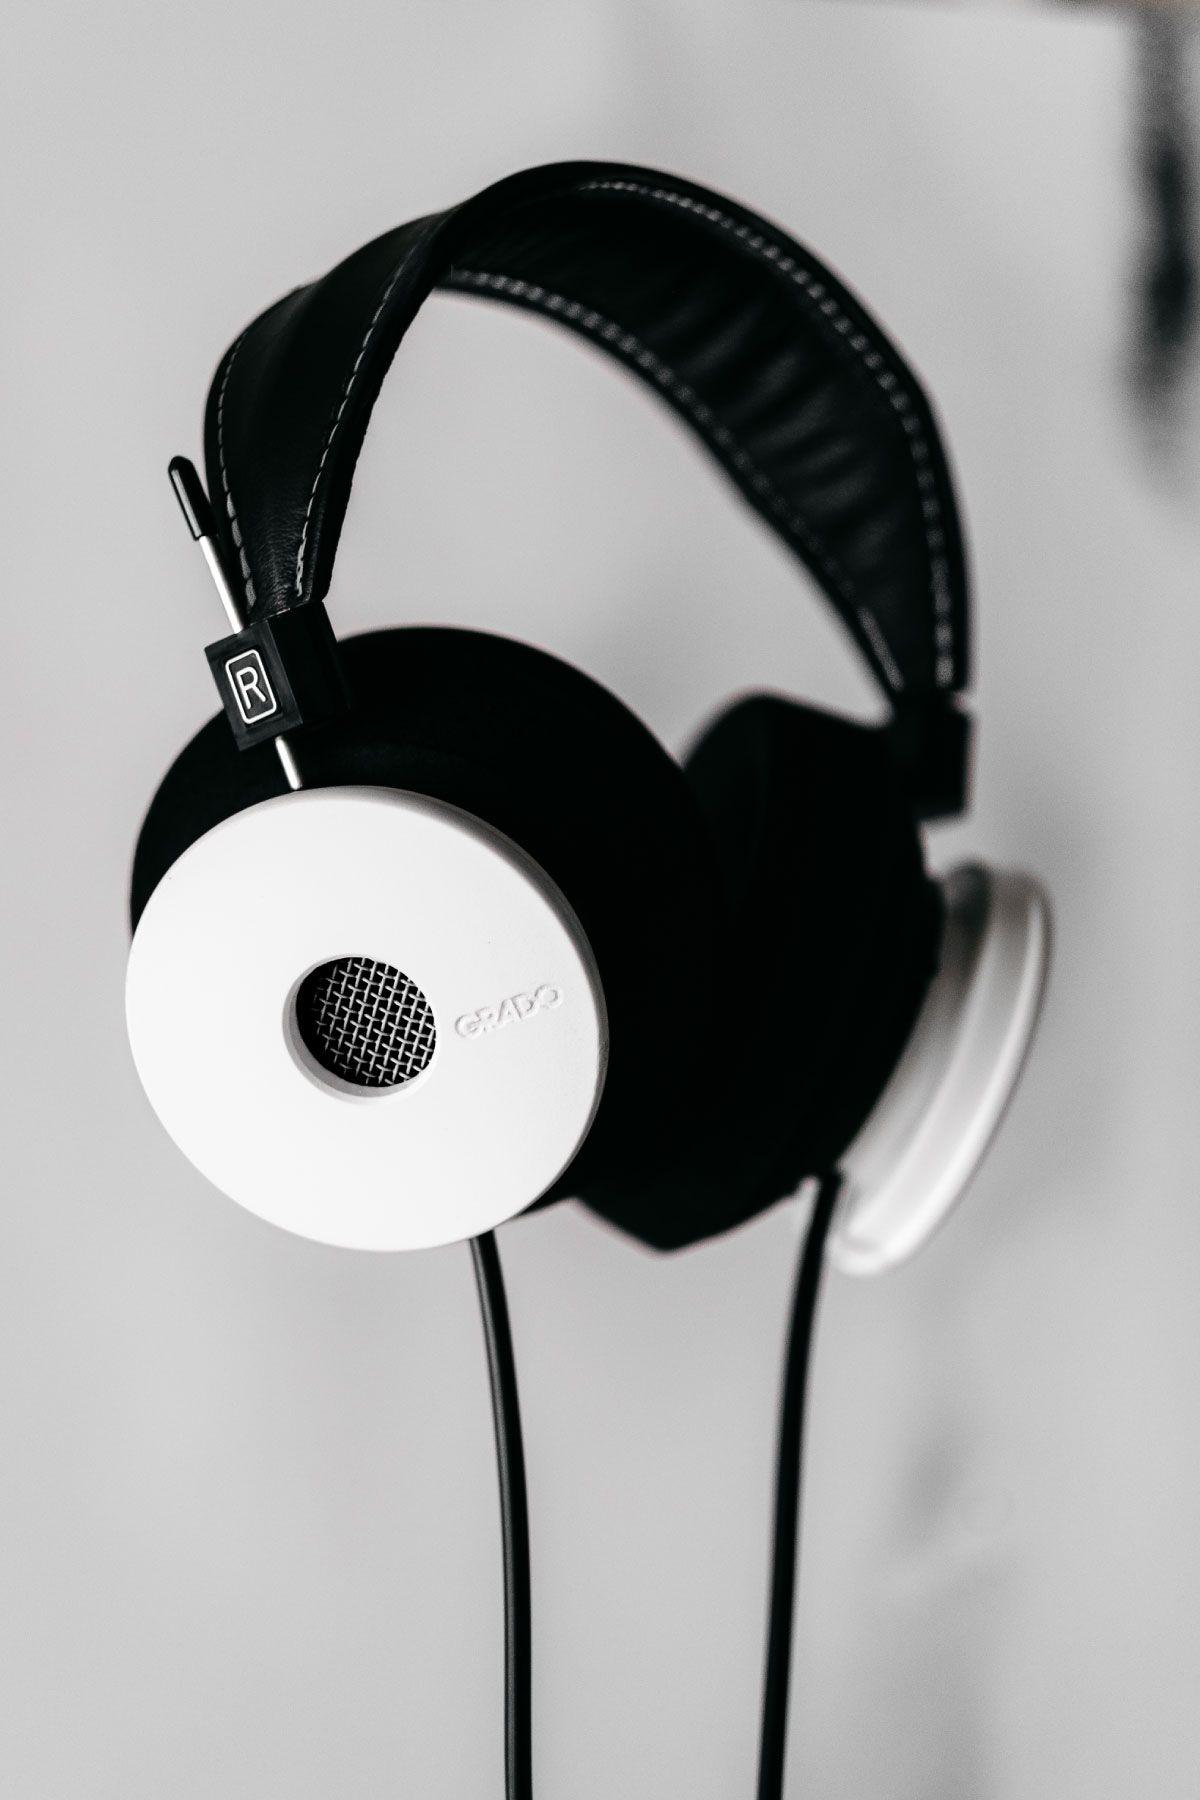 Grado Labs The White Headphone in 2020 White